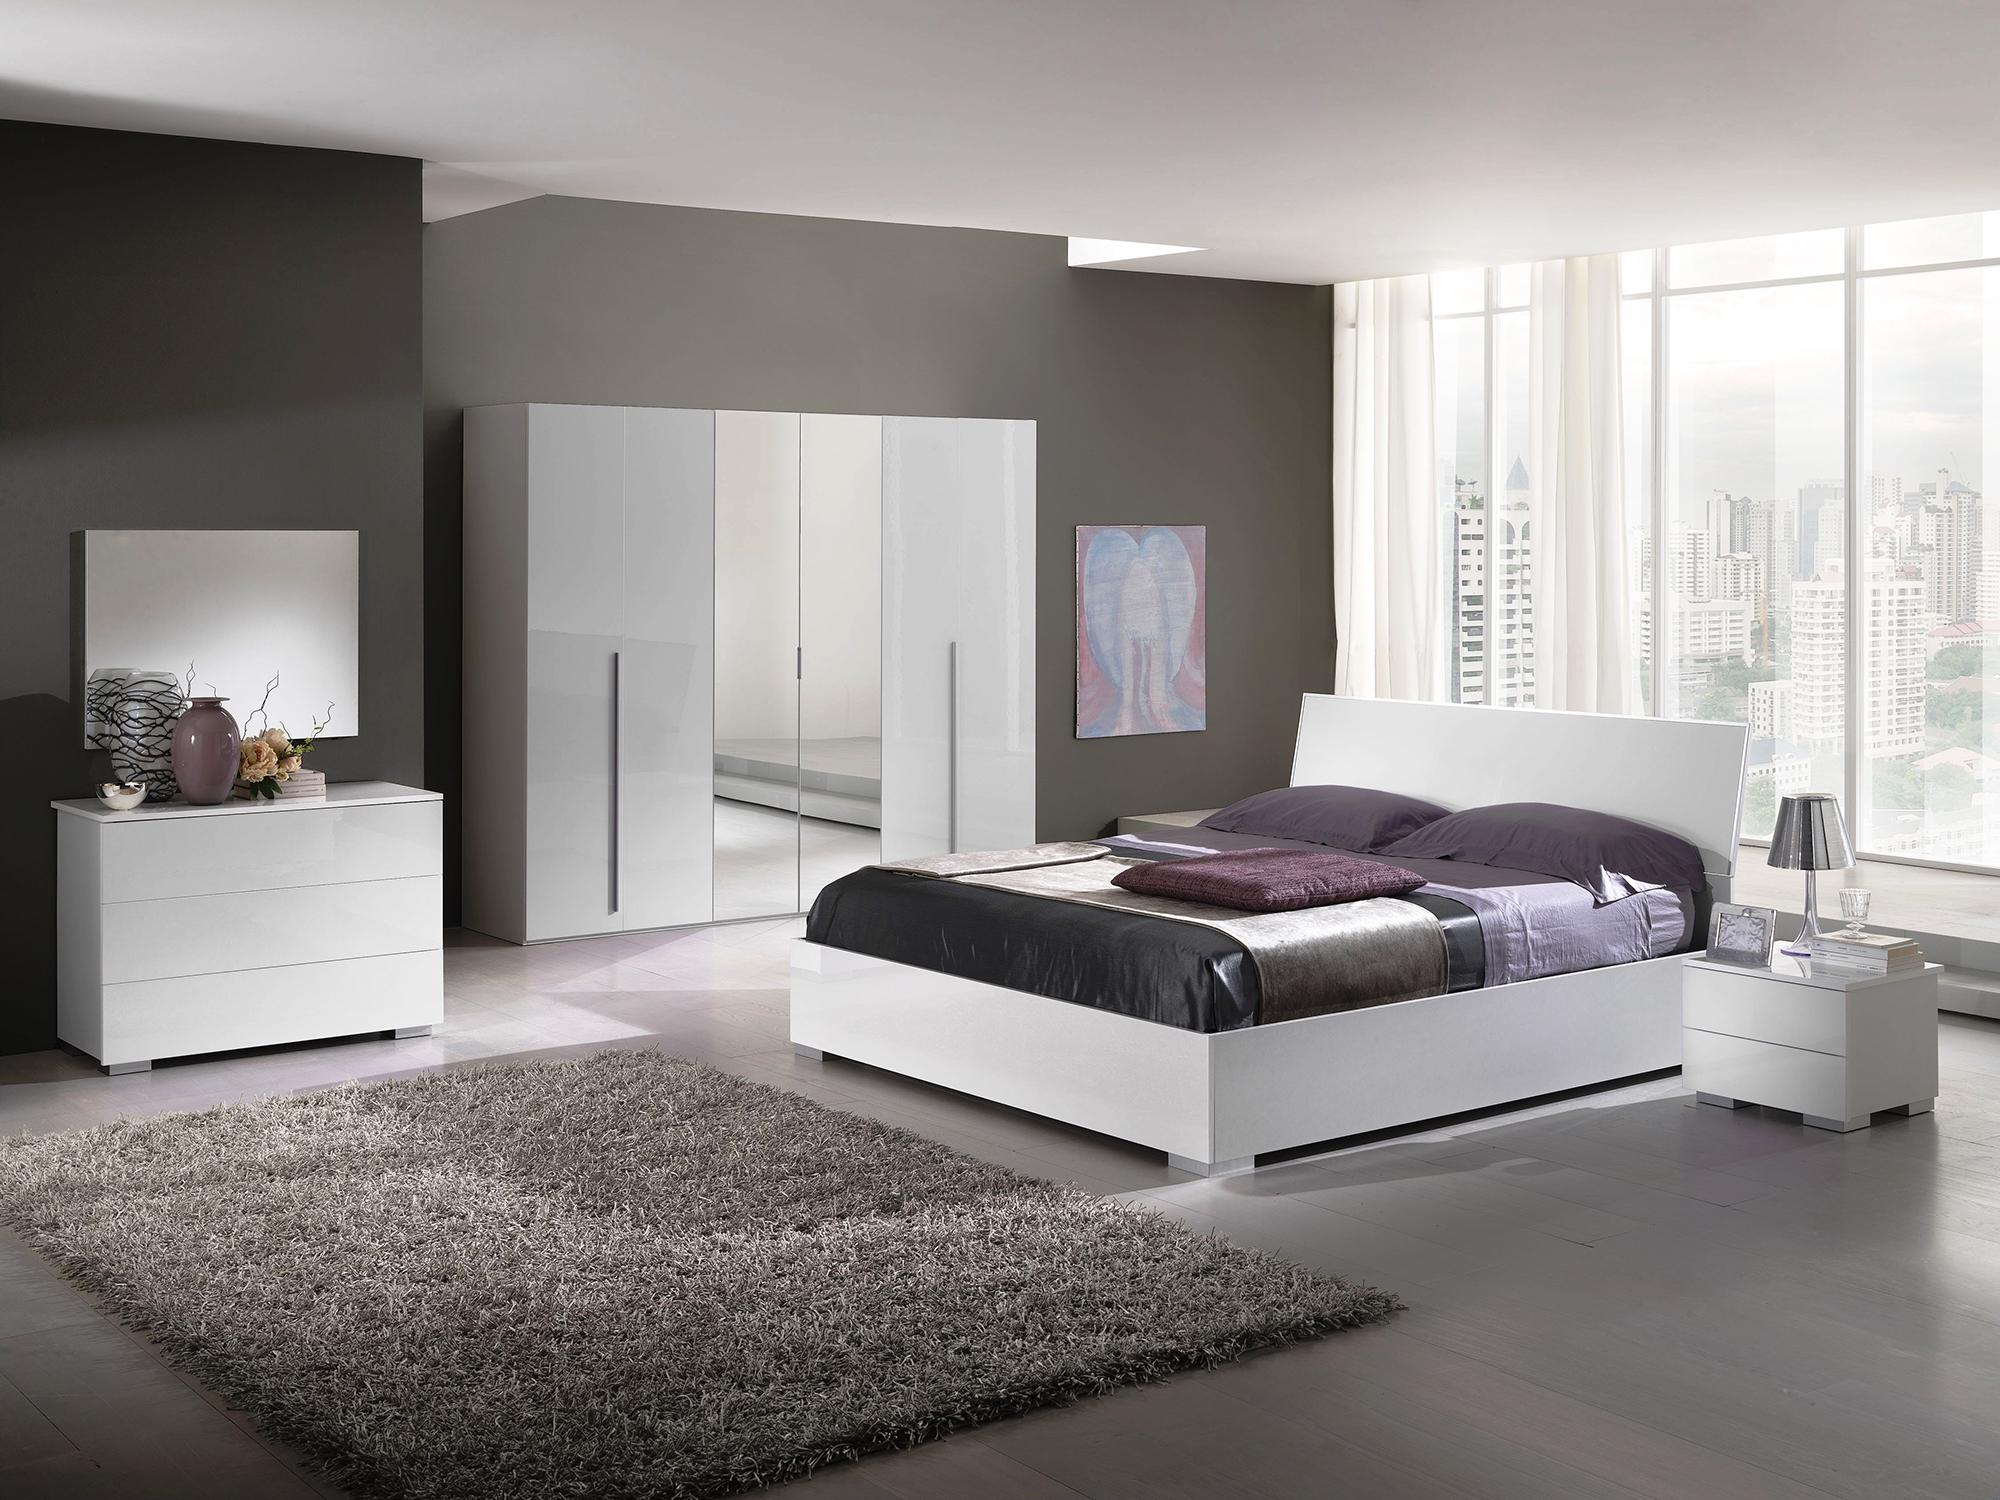 Серо-белый интерьер спальни в стиле модерн